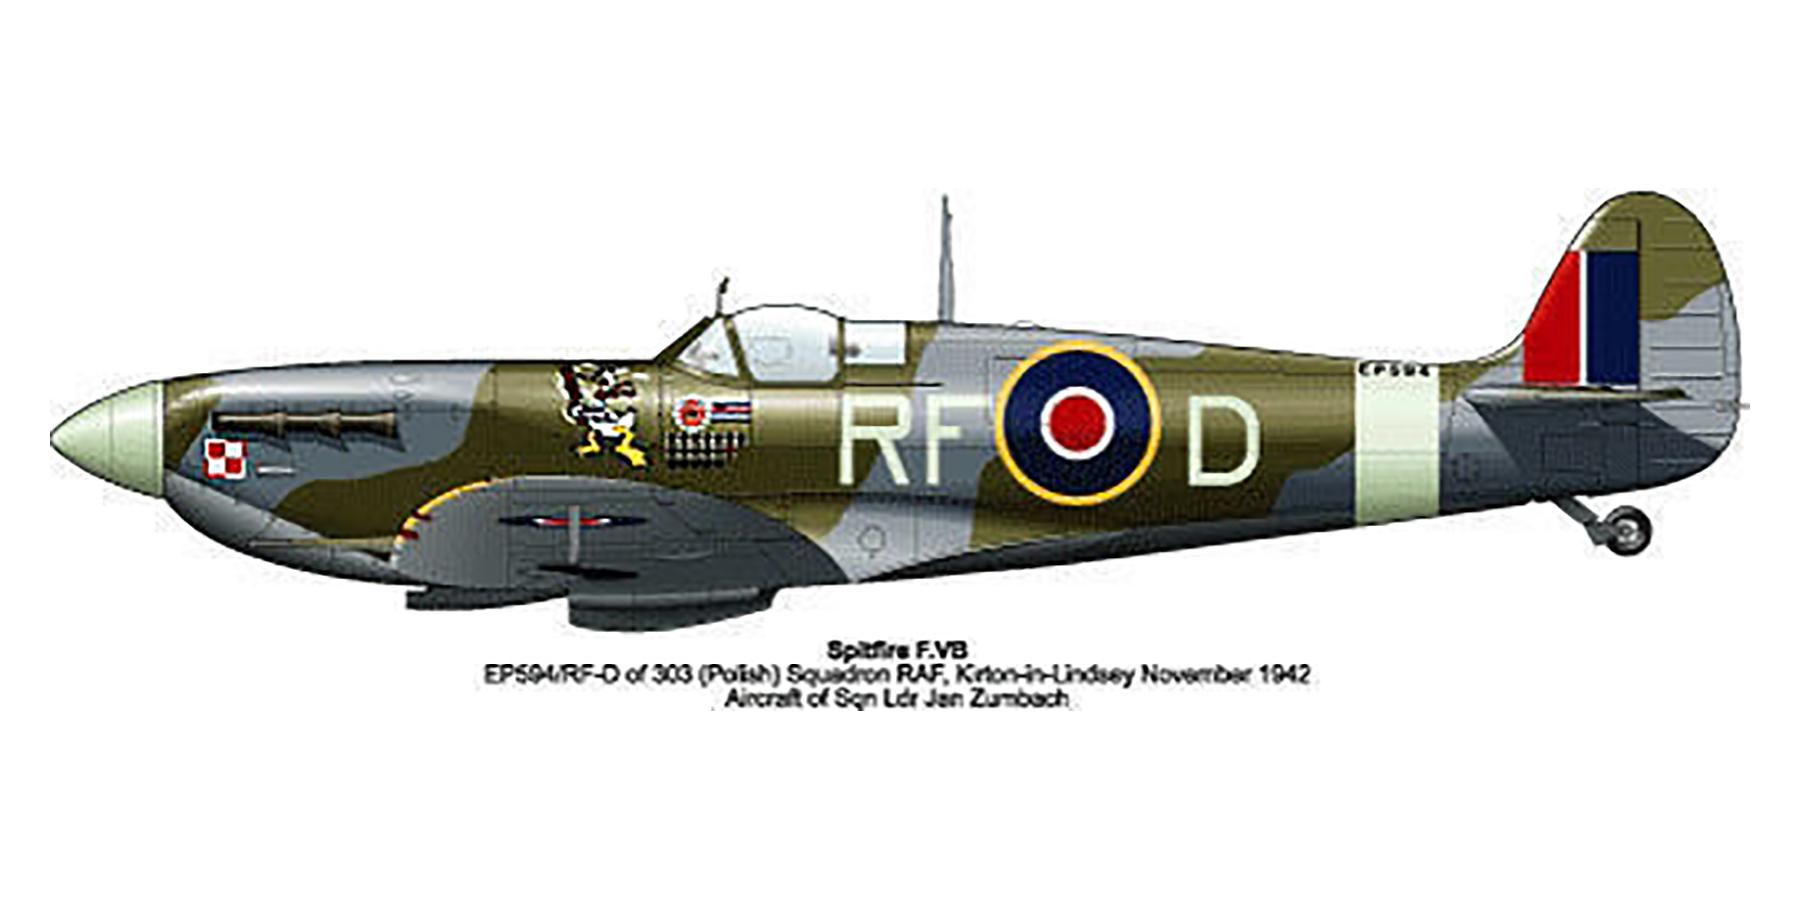 Spitfire MkVb RAF 303 Polish RFD Jan Zumbach EN951 Kirton in Lindsey 1942 0A